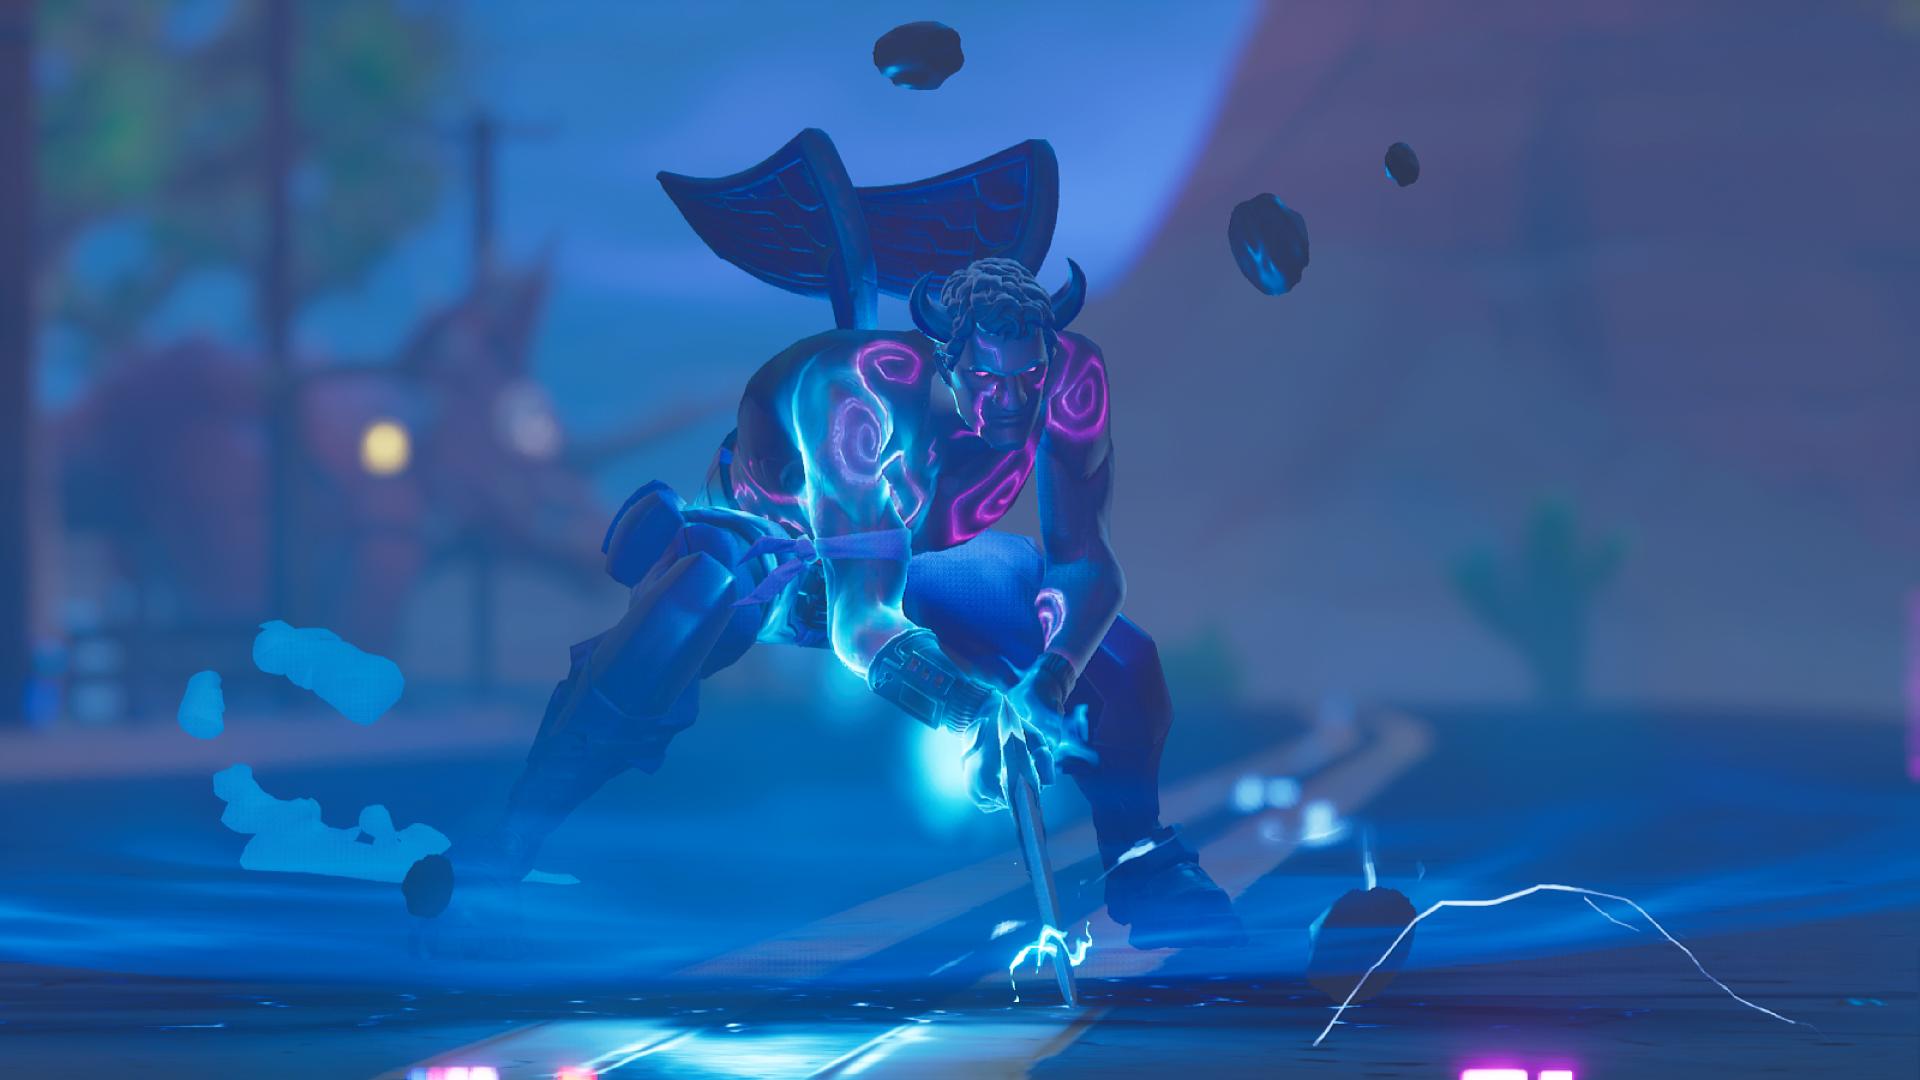 Cool screenshot I got of the Fallen Love Ranger using the Infinity 1920x1080